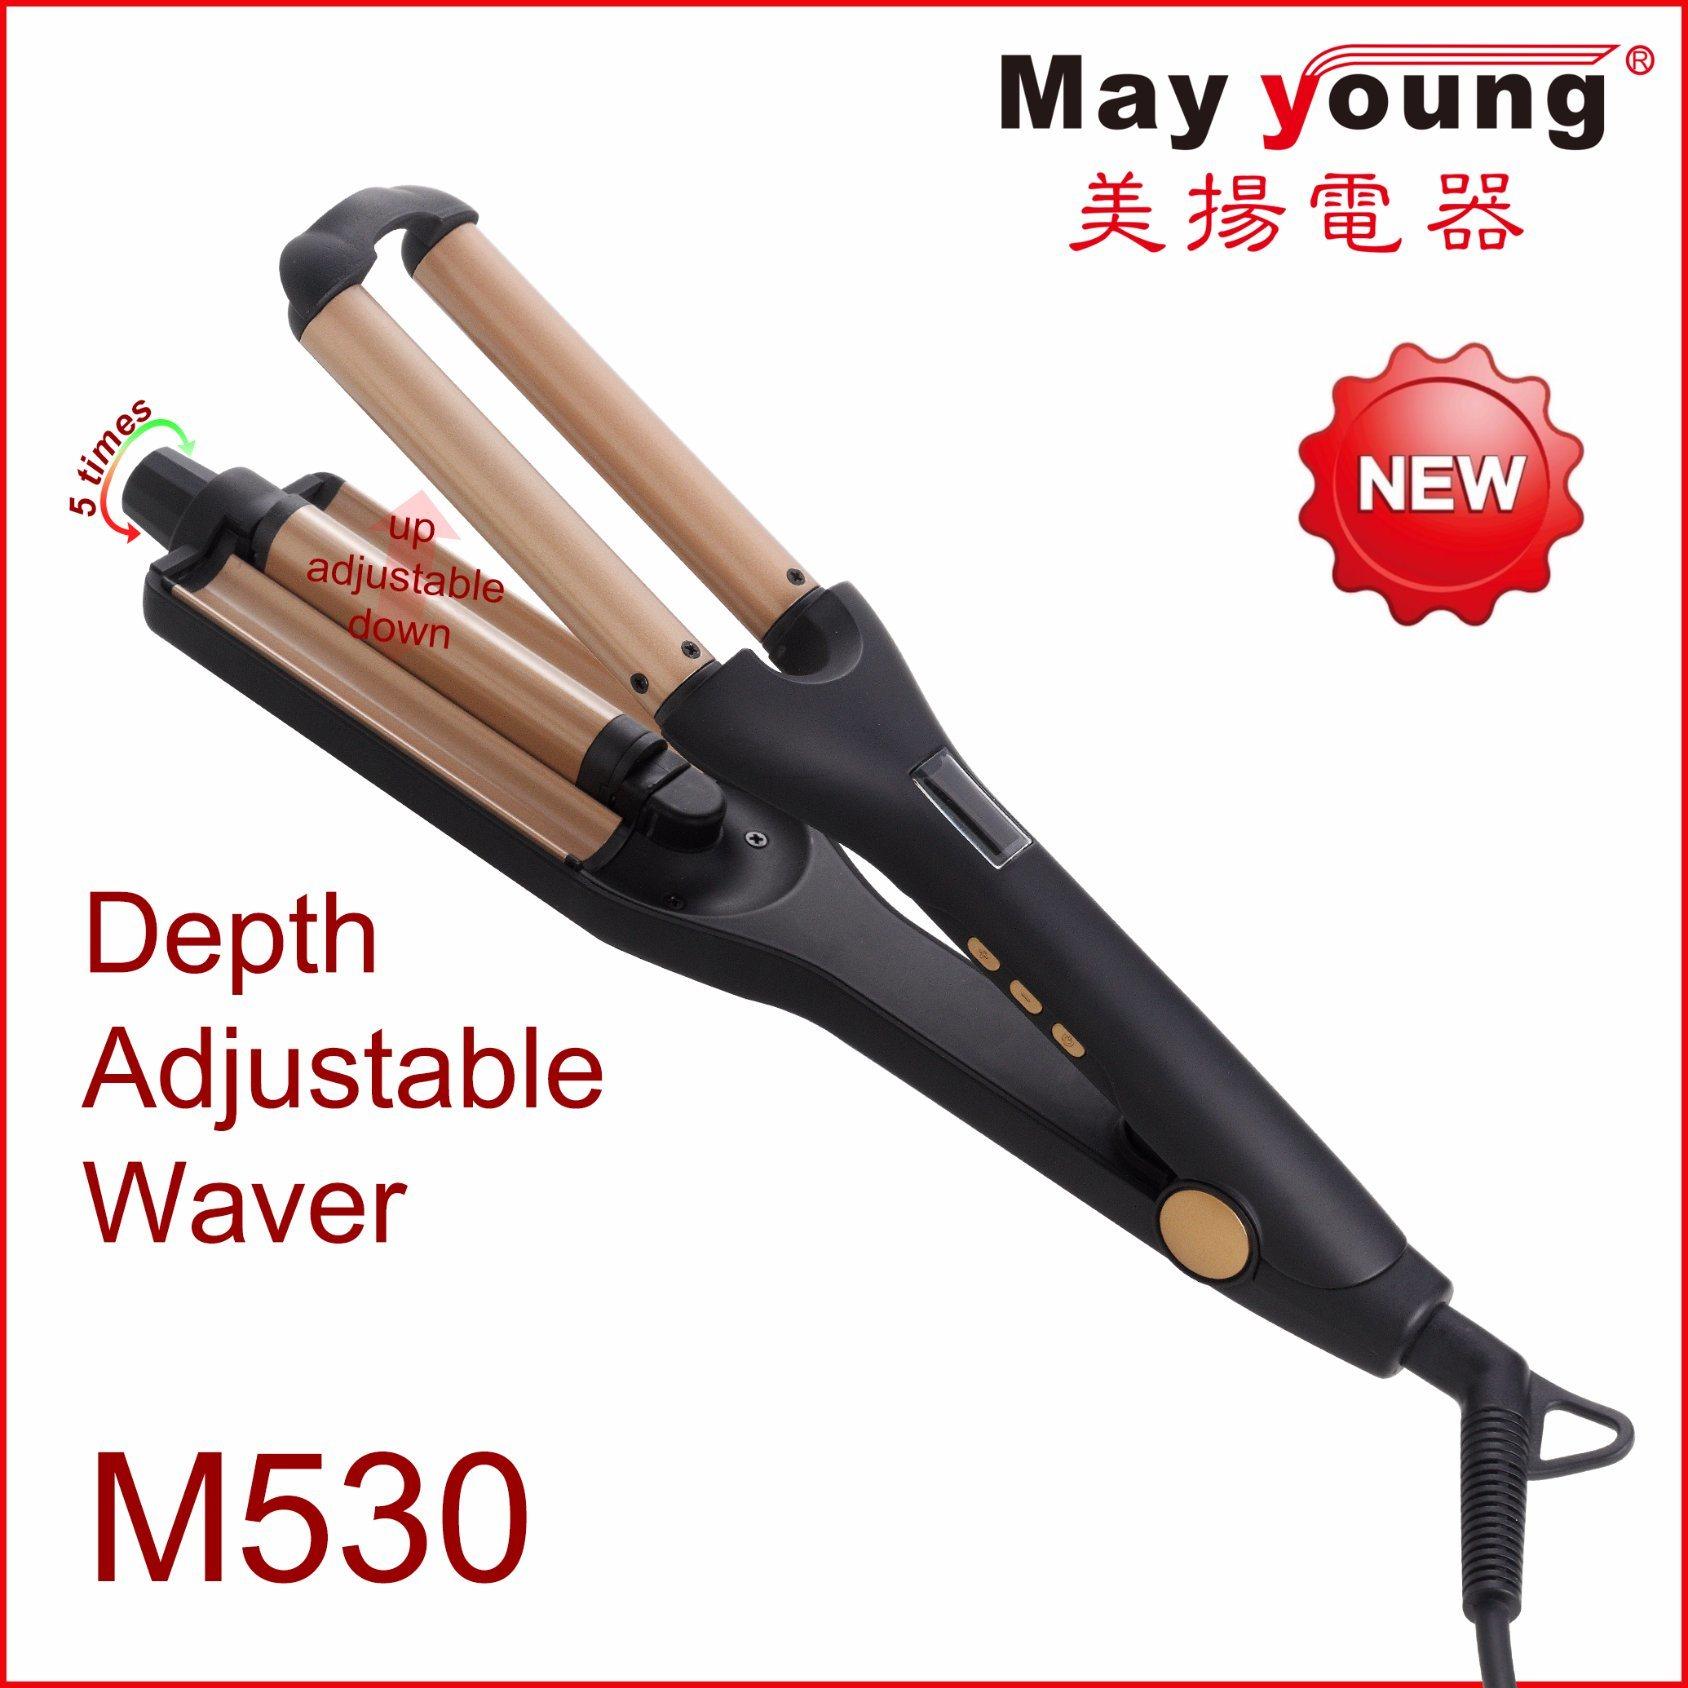 2017 New Products Adjustable 3 Barrel Waver Triple Barrel Hair Curling Iron Hair Curler